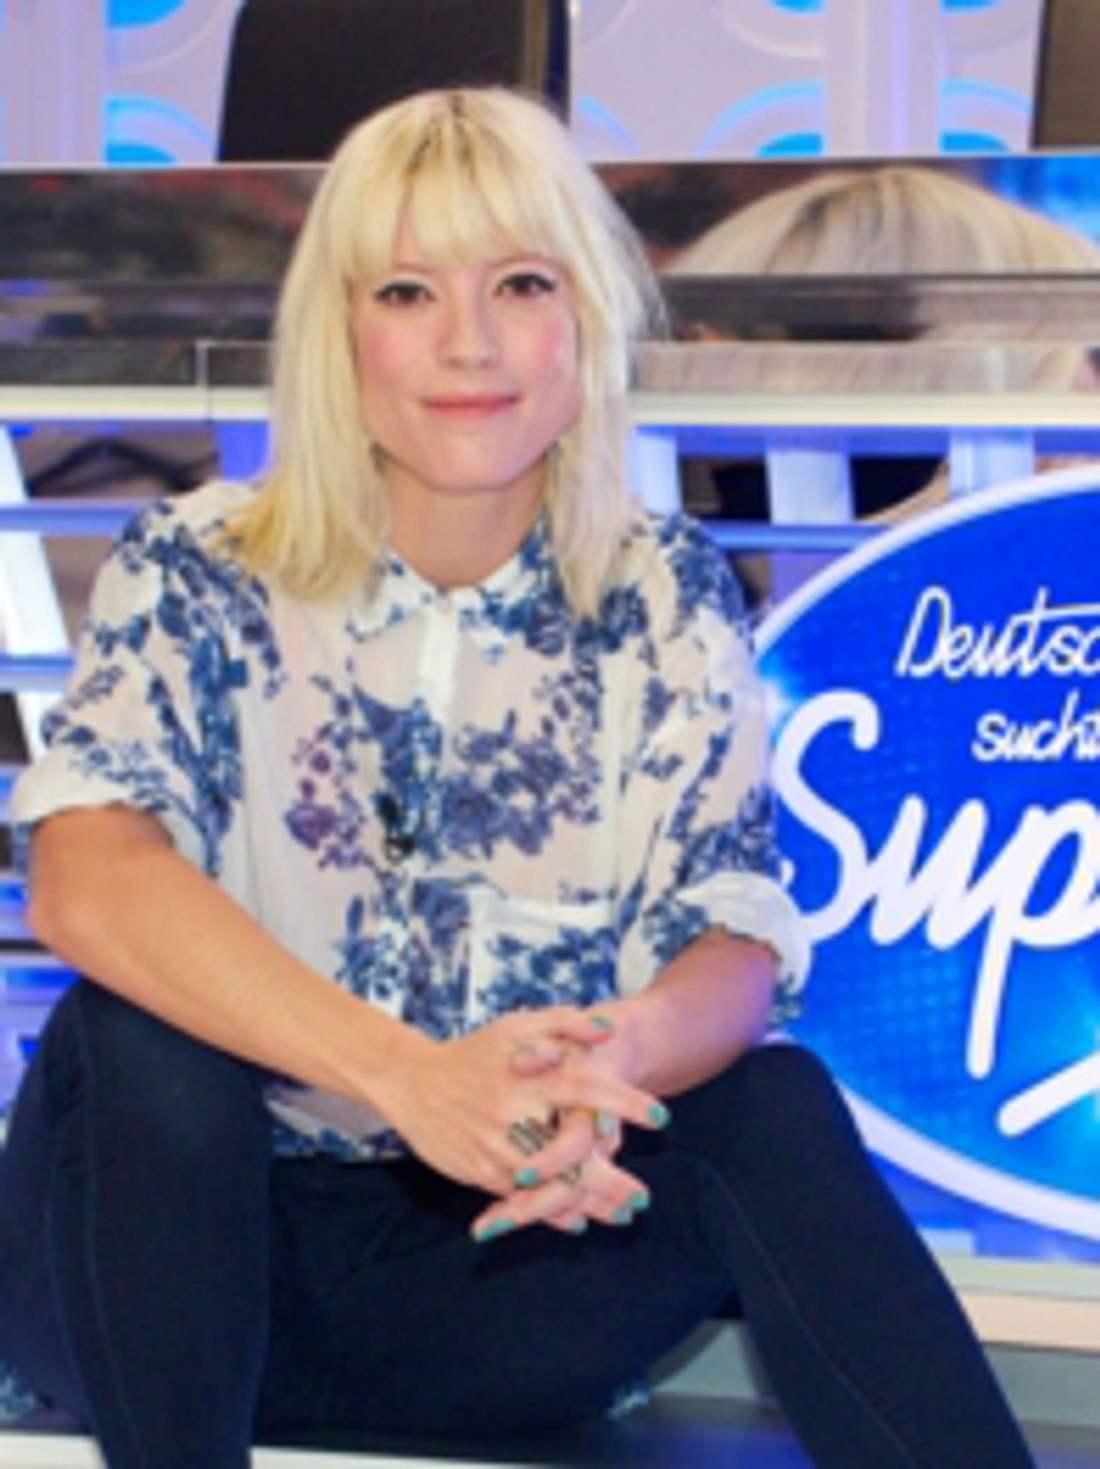 DSDS 2014: Schmeißt Dieter Mieze Katz aus der Jury?